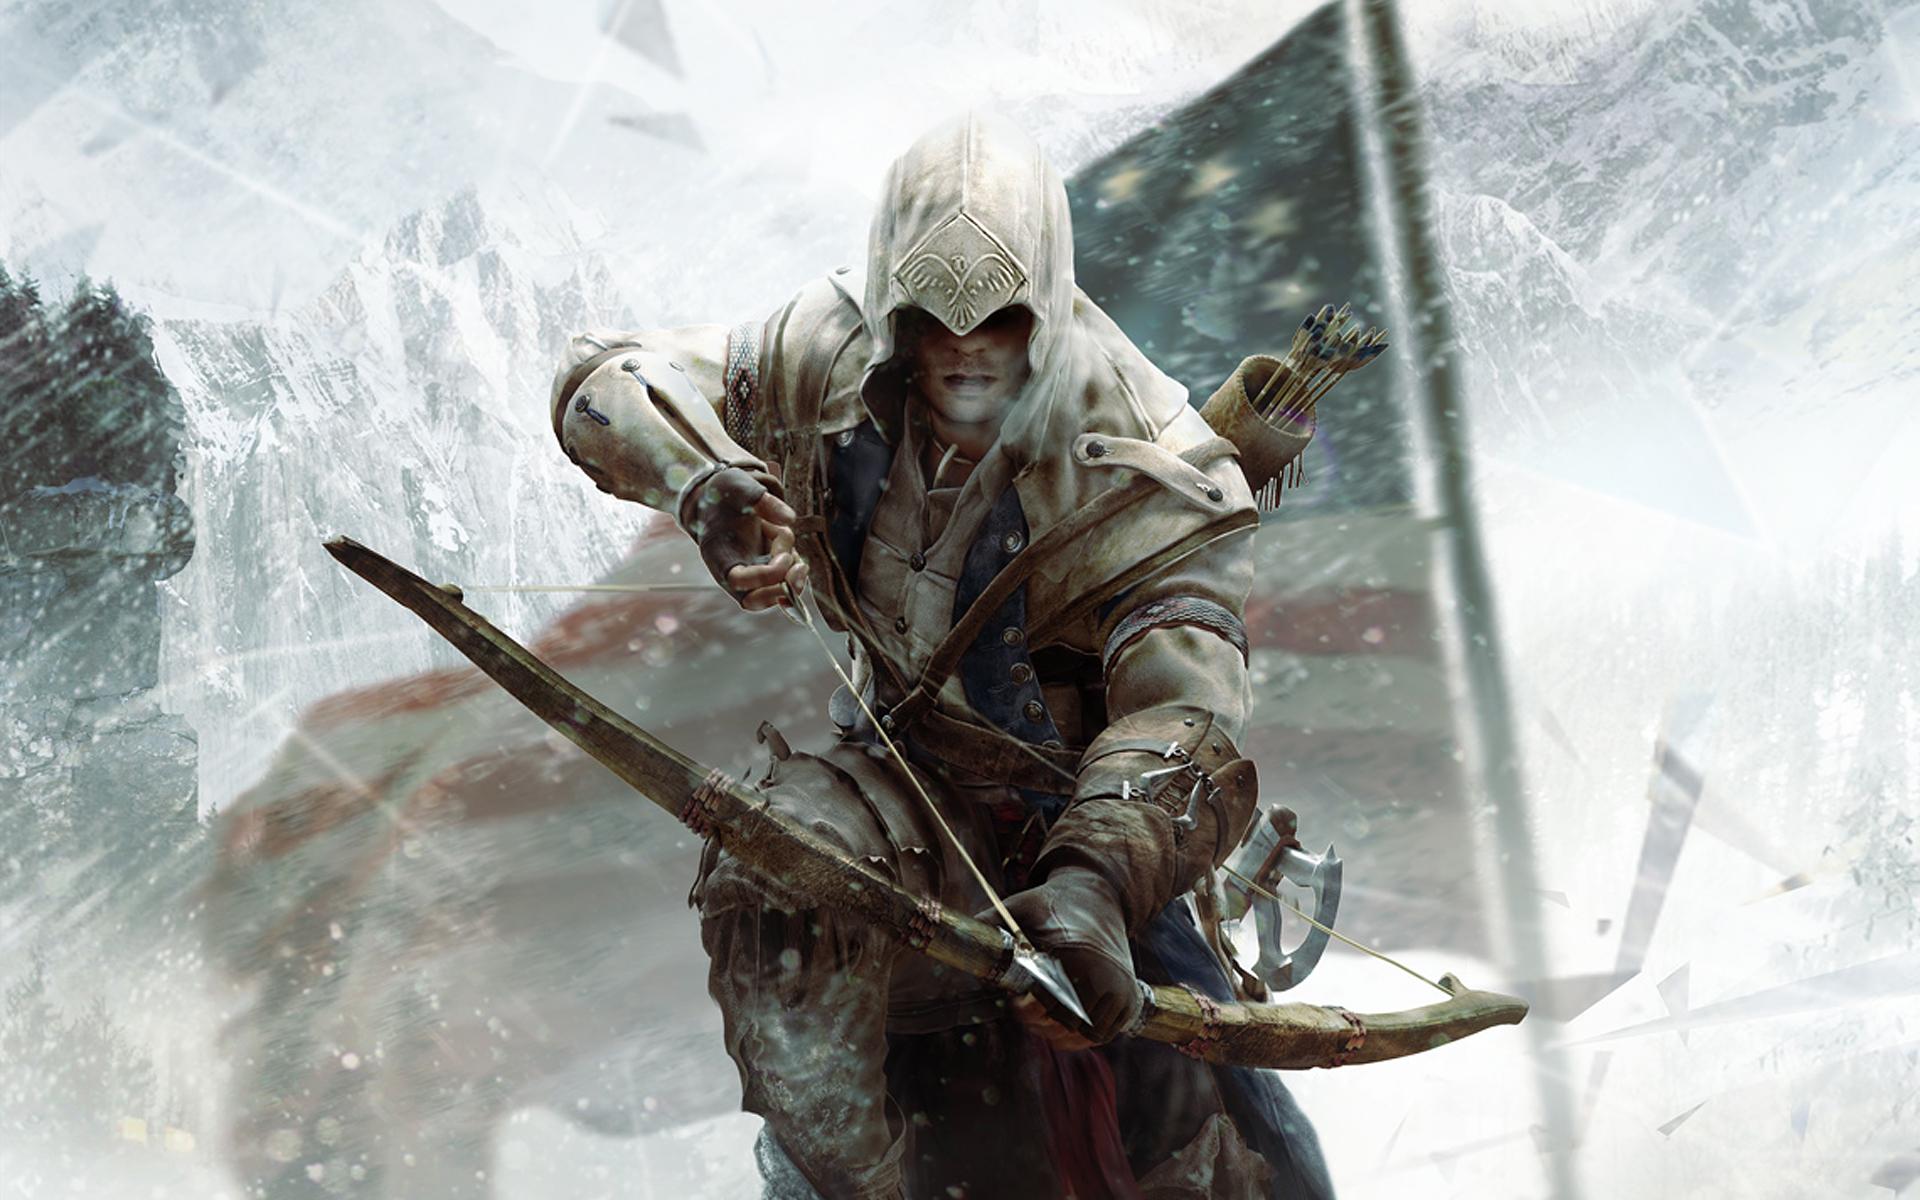 uPlay_PC_Wallpaper2_1920x1200.jpg - Assassin's Creed 3